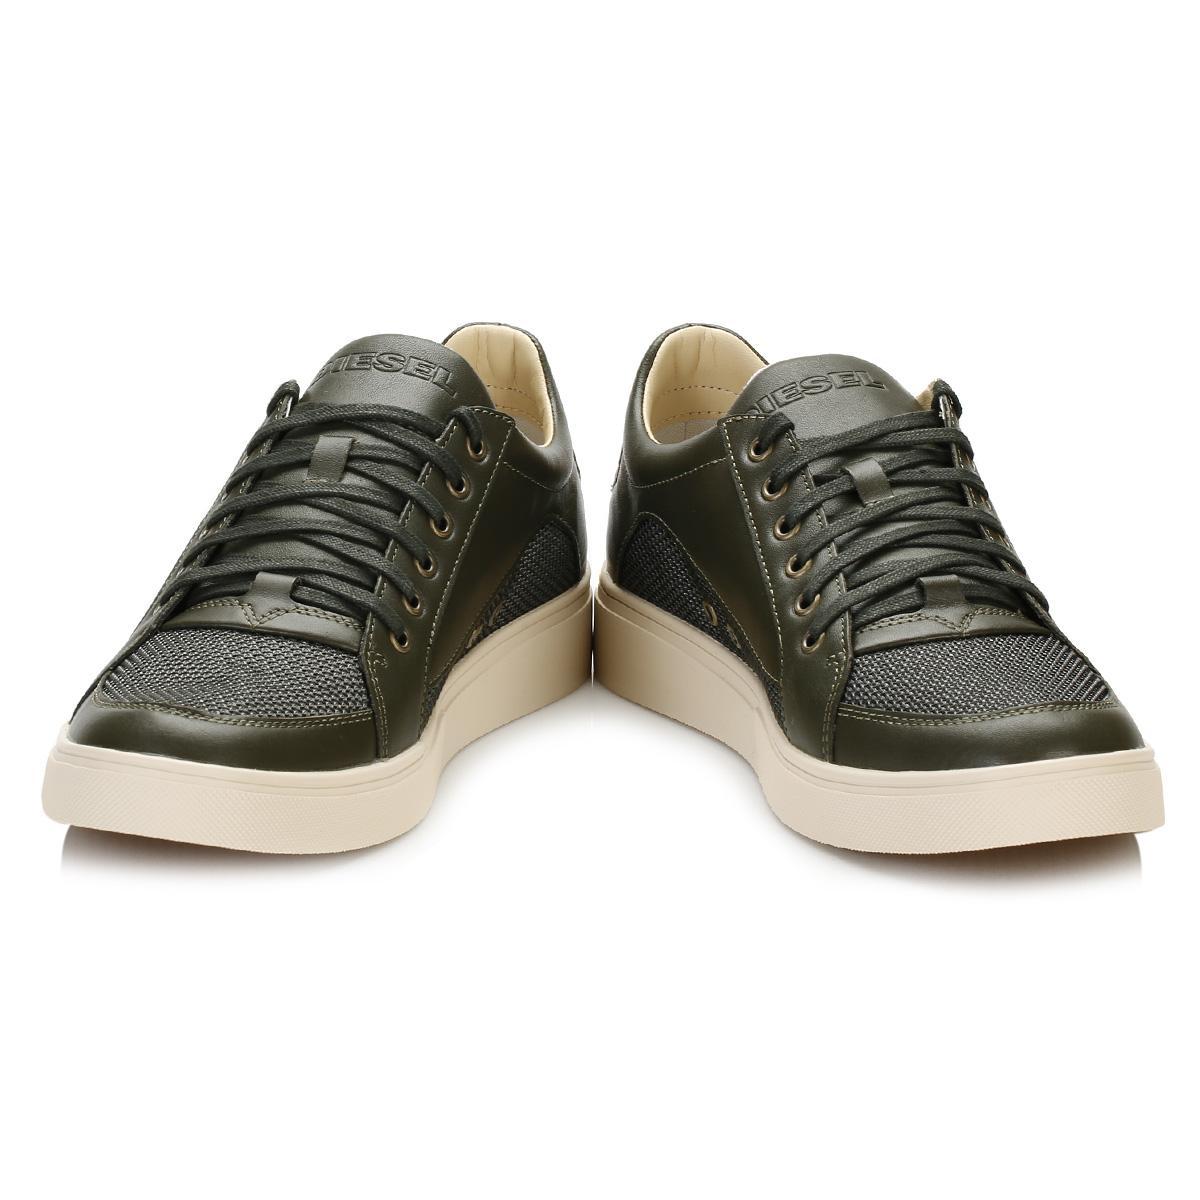 Mens Lacoste Shoes Nordstrom